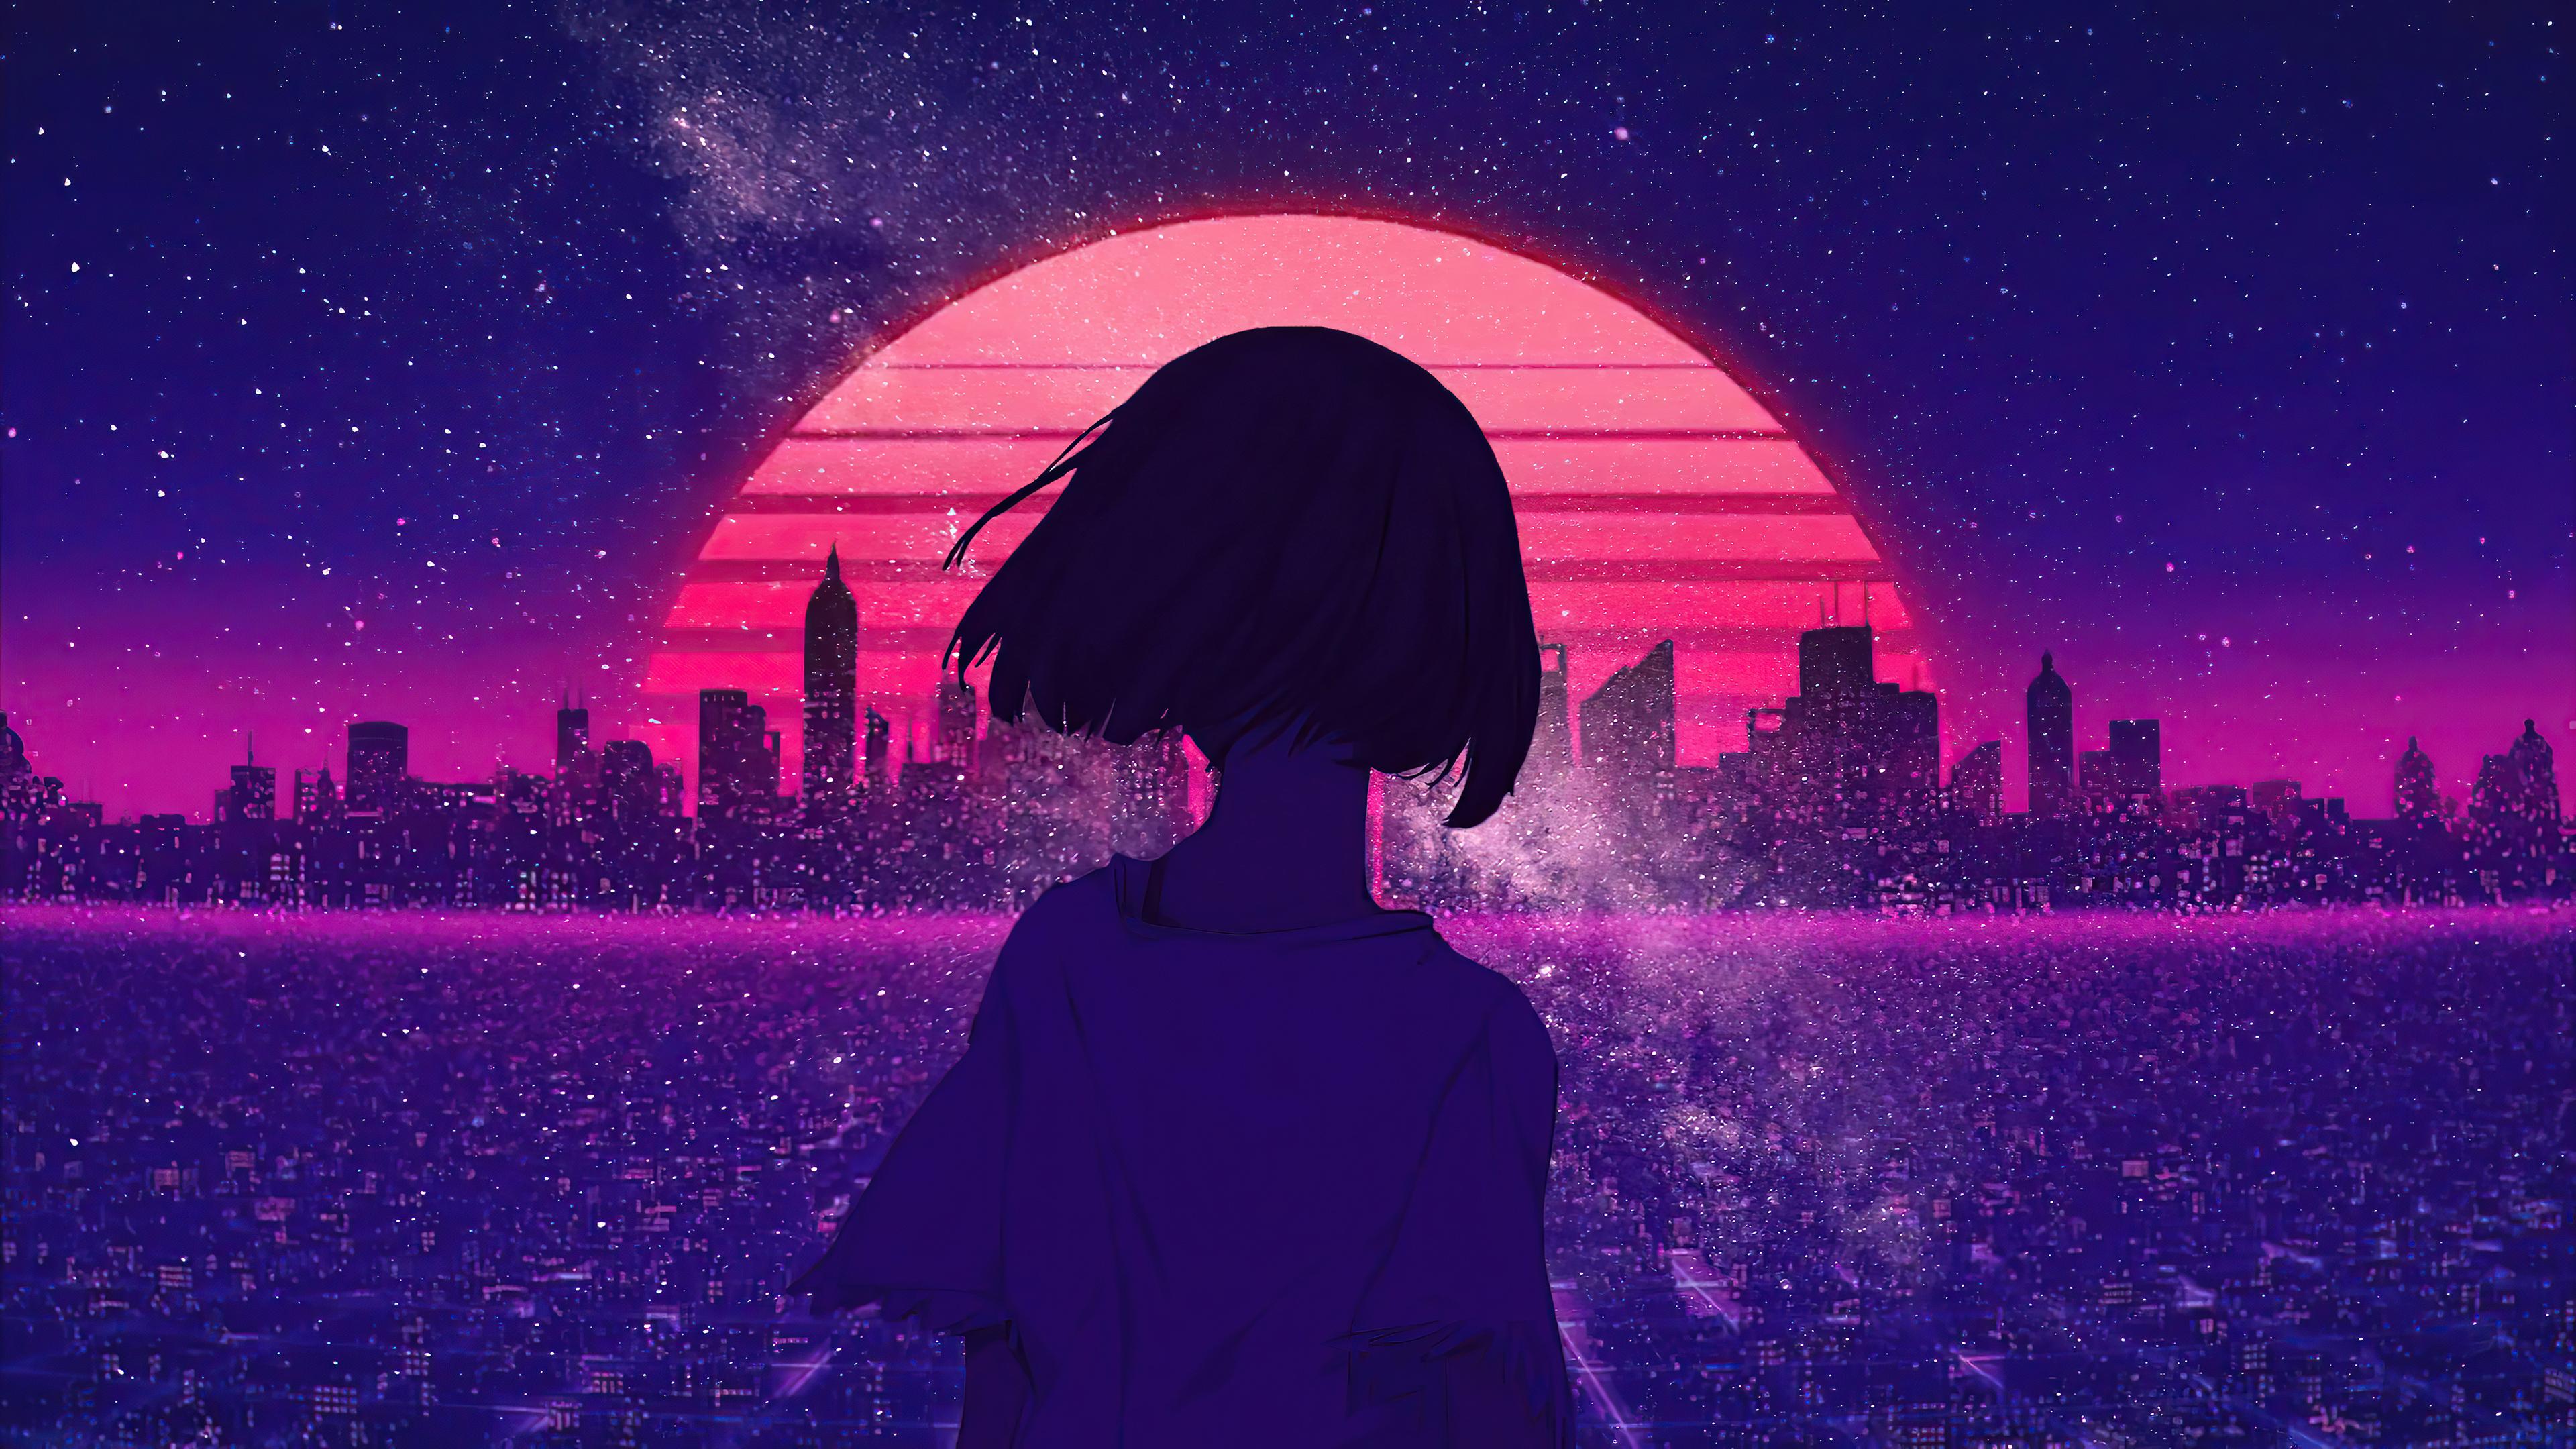 synthwave night sunset anime girl 4k 1608581305 - Synthwave Night Sunset Anime Girl 4k - Synthwave Night Sunset Anime Girl 4k wallpapers